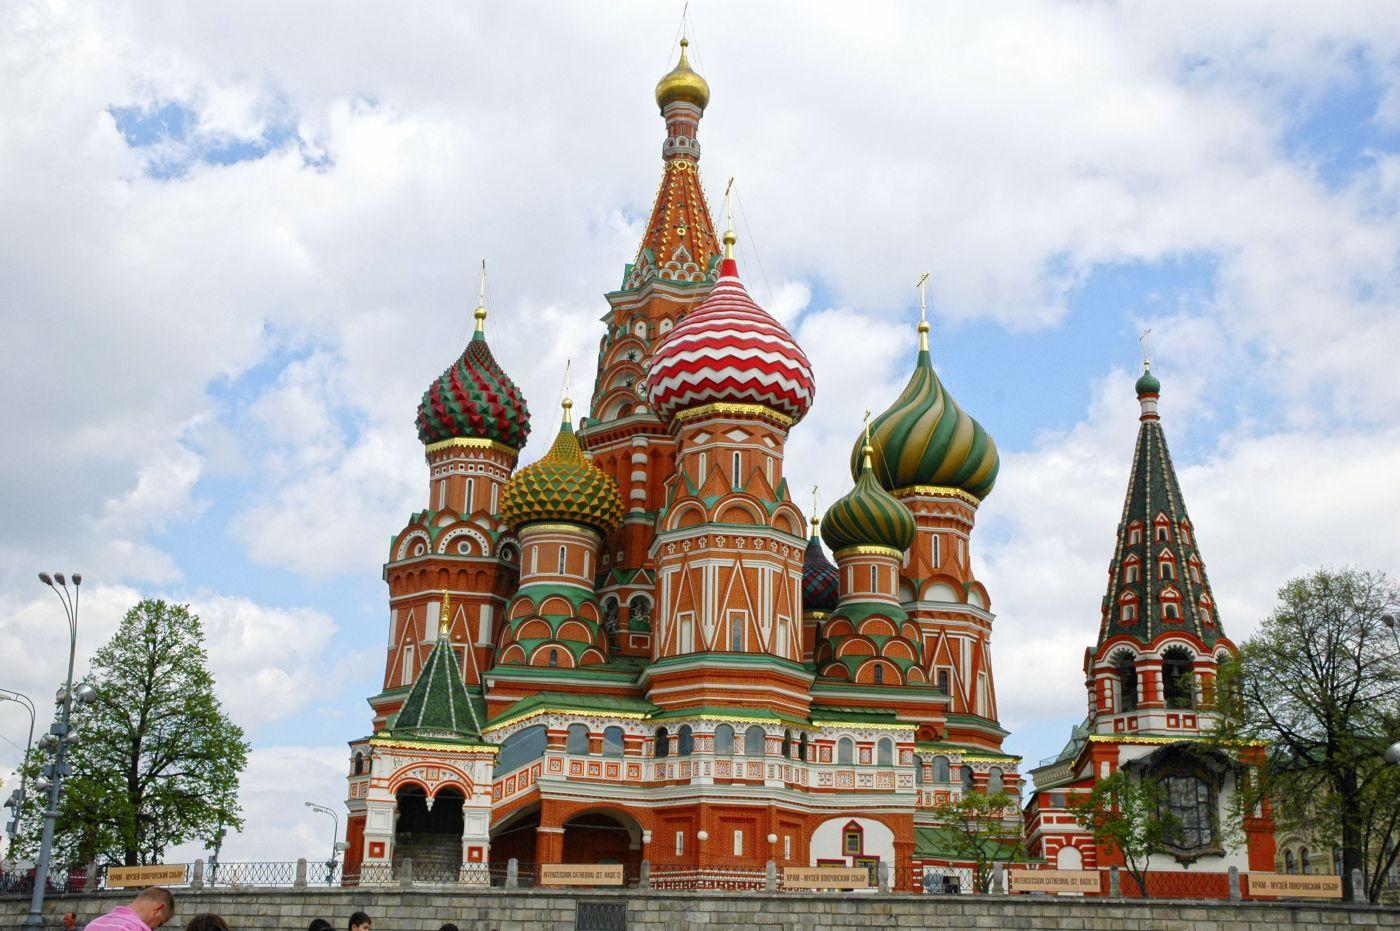 Moskau_Basilius_Kathedrale (c) Studiosus Gruppenreisen